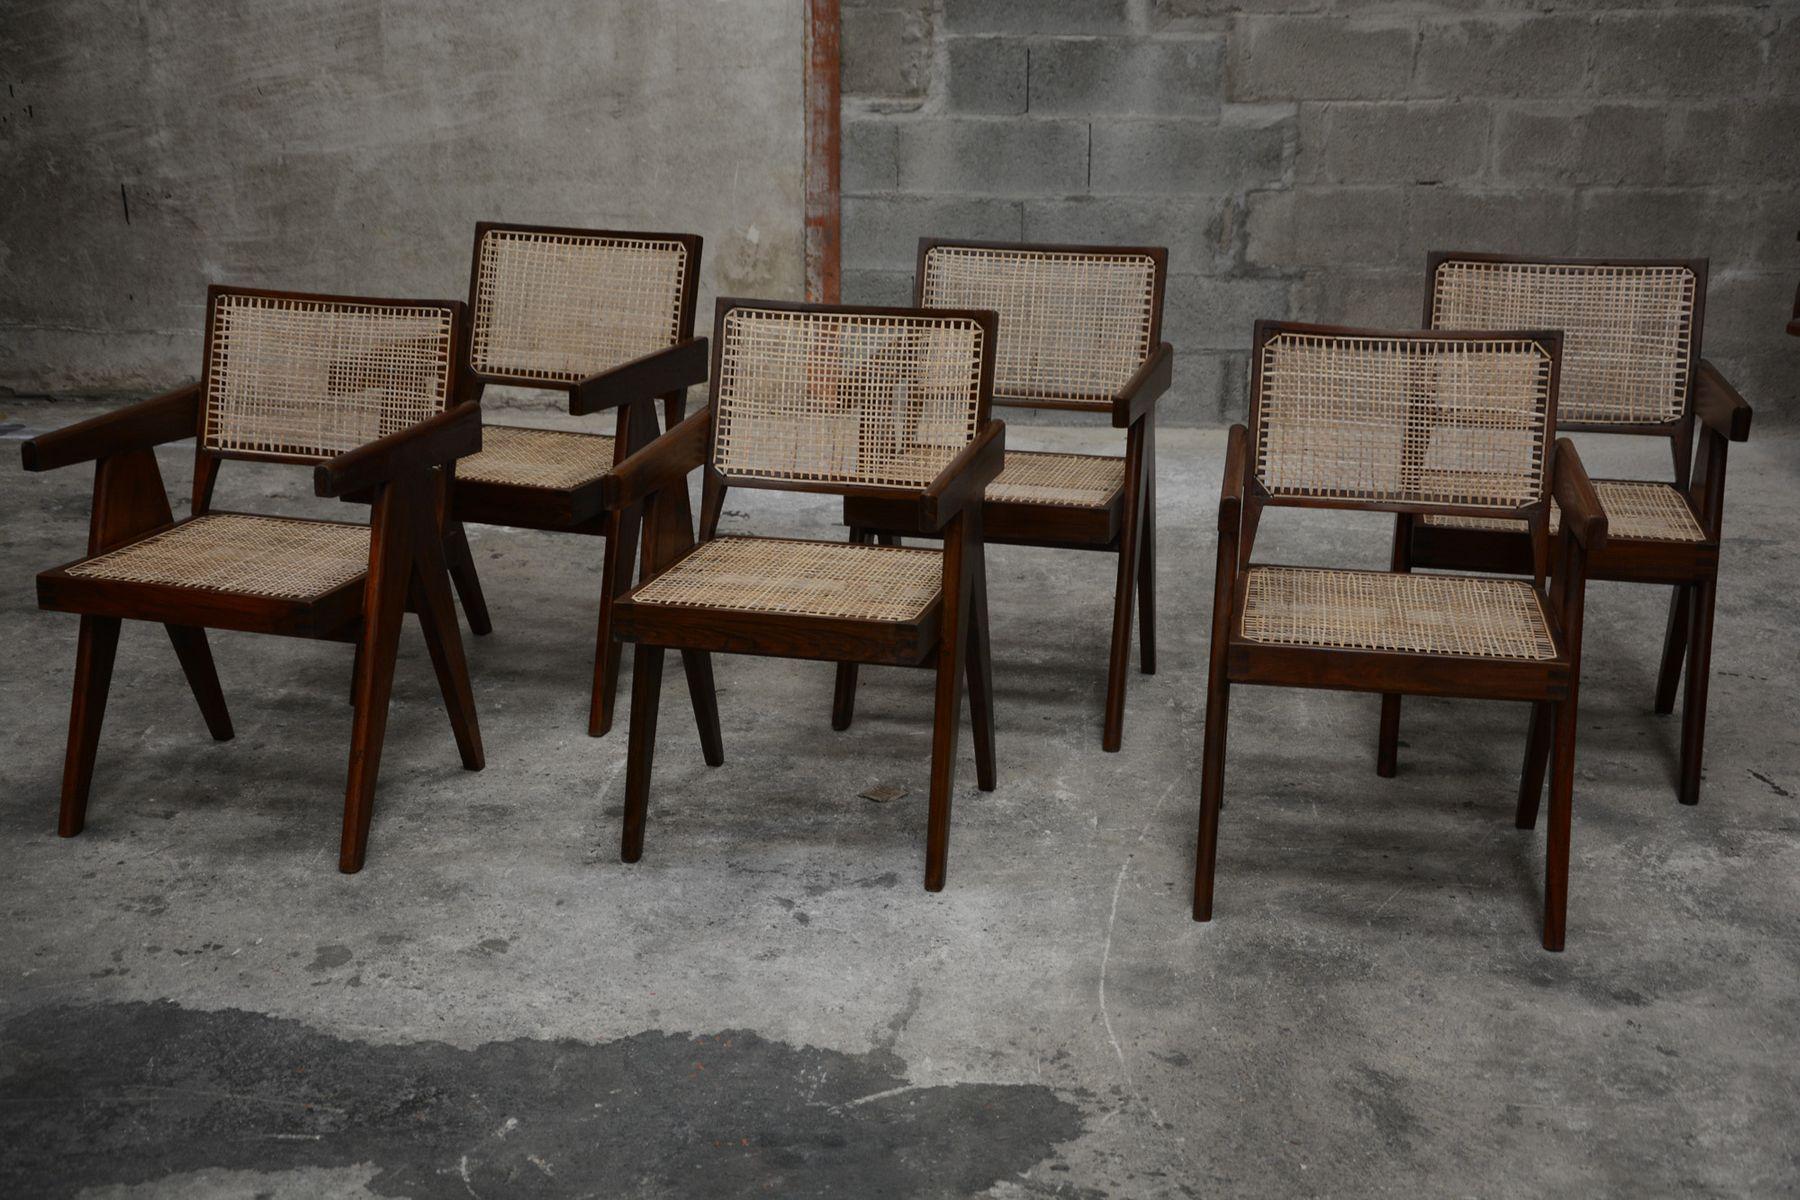 st hle von pierre jeanneret 1958 6er set bei pamono kaufen. Black Bedroom Furniture Sets. Home Design Ideas